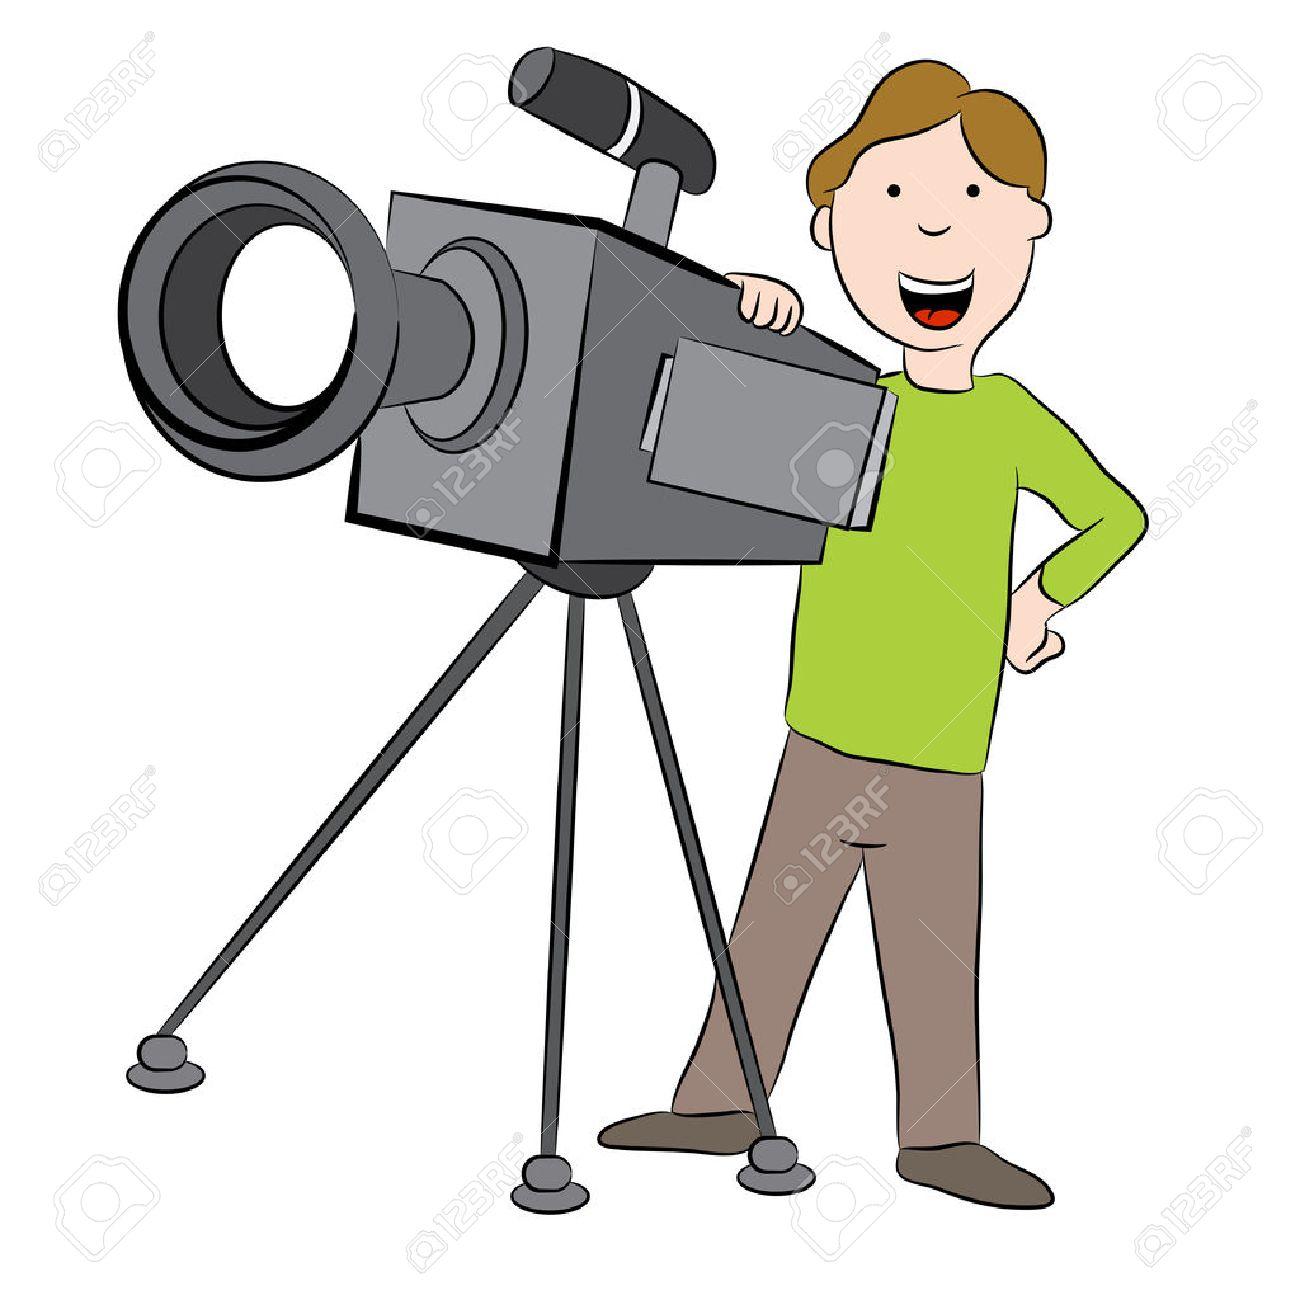 Cameraman clipart 3 » Clipart Station.